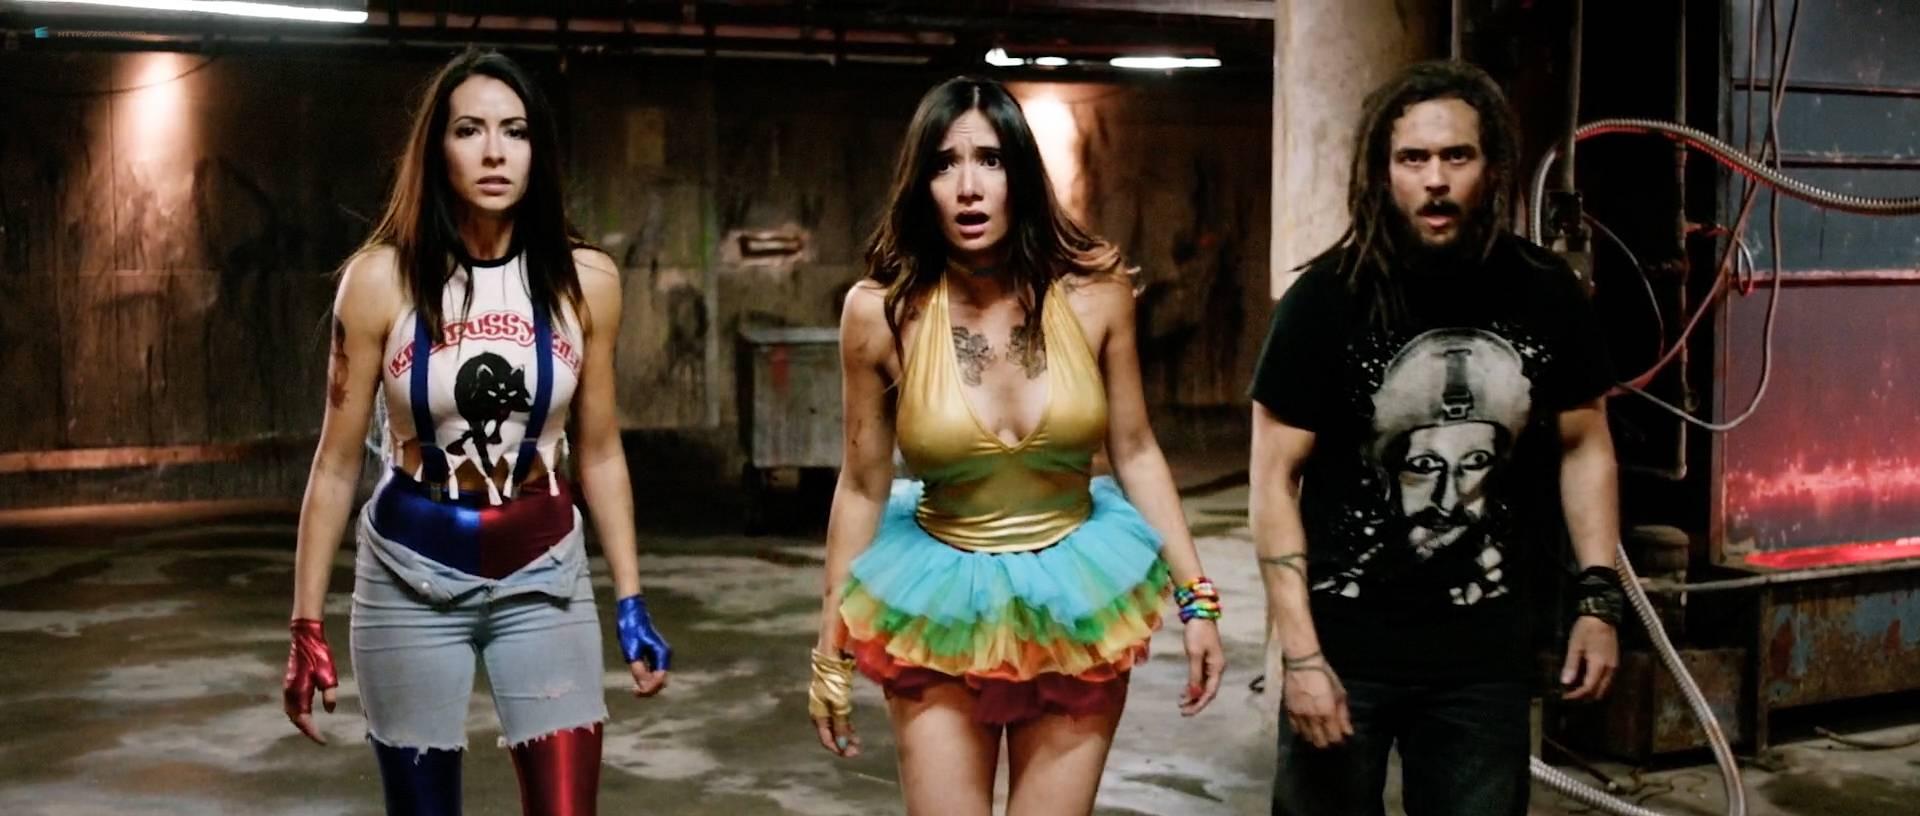 Sara-Malakul-Lane-nude-toples-Kelly-McCart-and-Amanda-Ruth-Ritchie-nude-too-Halloween-Pussy-Trap-Kill-Kill-2017-HD-1080p-Web-006.jpg